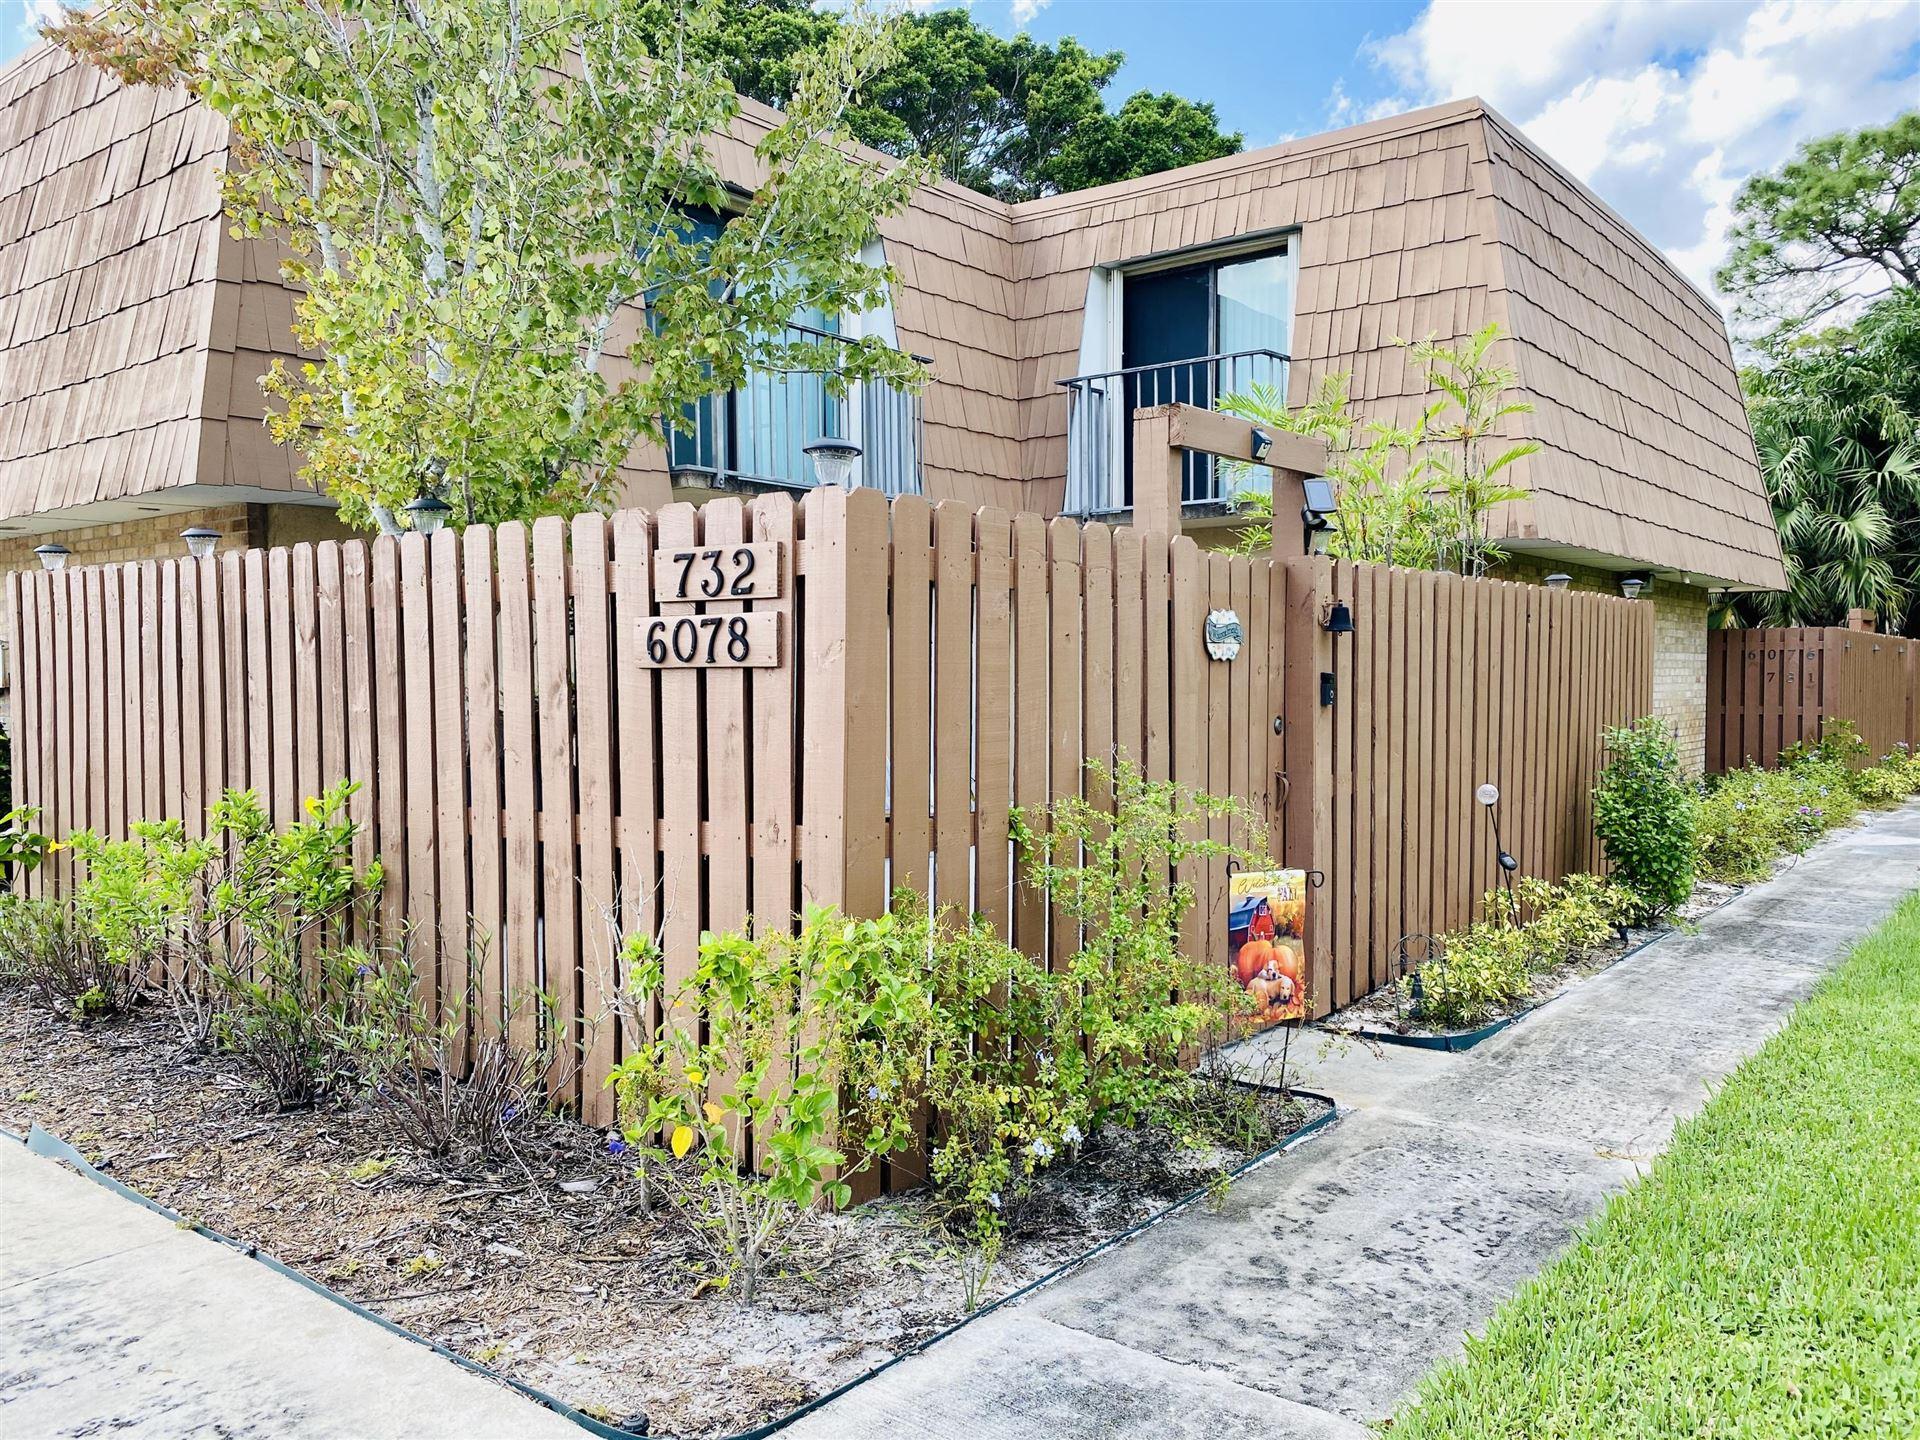 6078 SE Riverboat Drive, Stuart, FL 34997 - #: RX-10662672